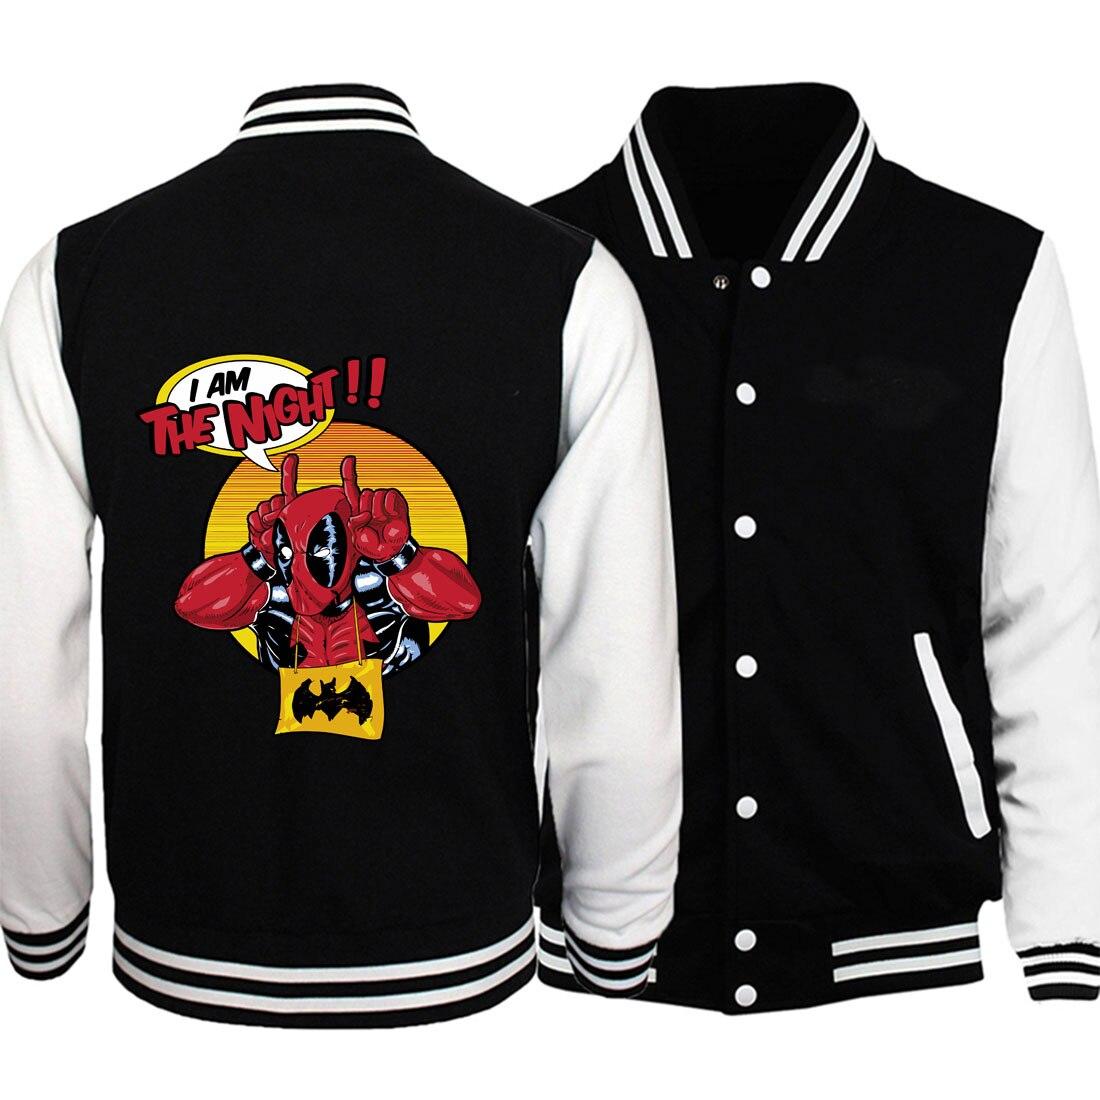 funny deadpool printing sweatshirts men 2019 new stranger things baseball jackets plus size fitness coats fashion hoodies S-5XL